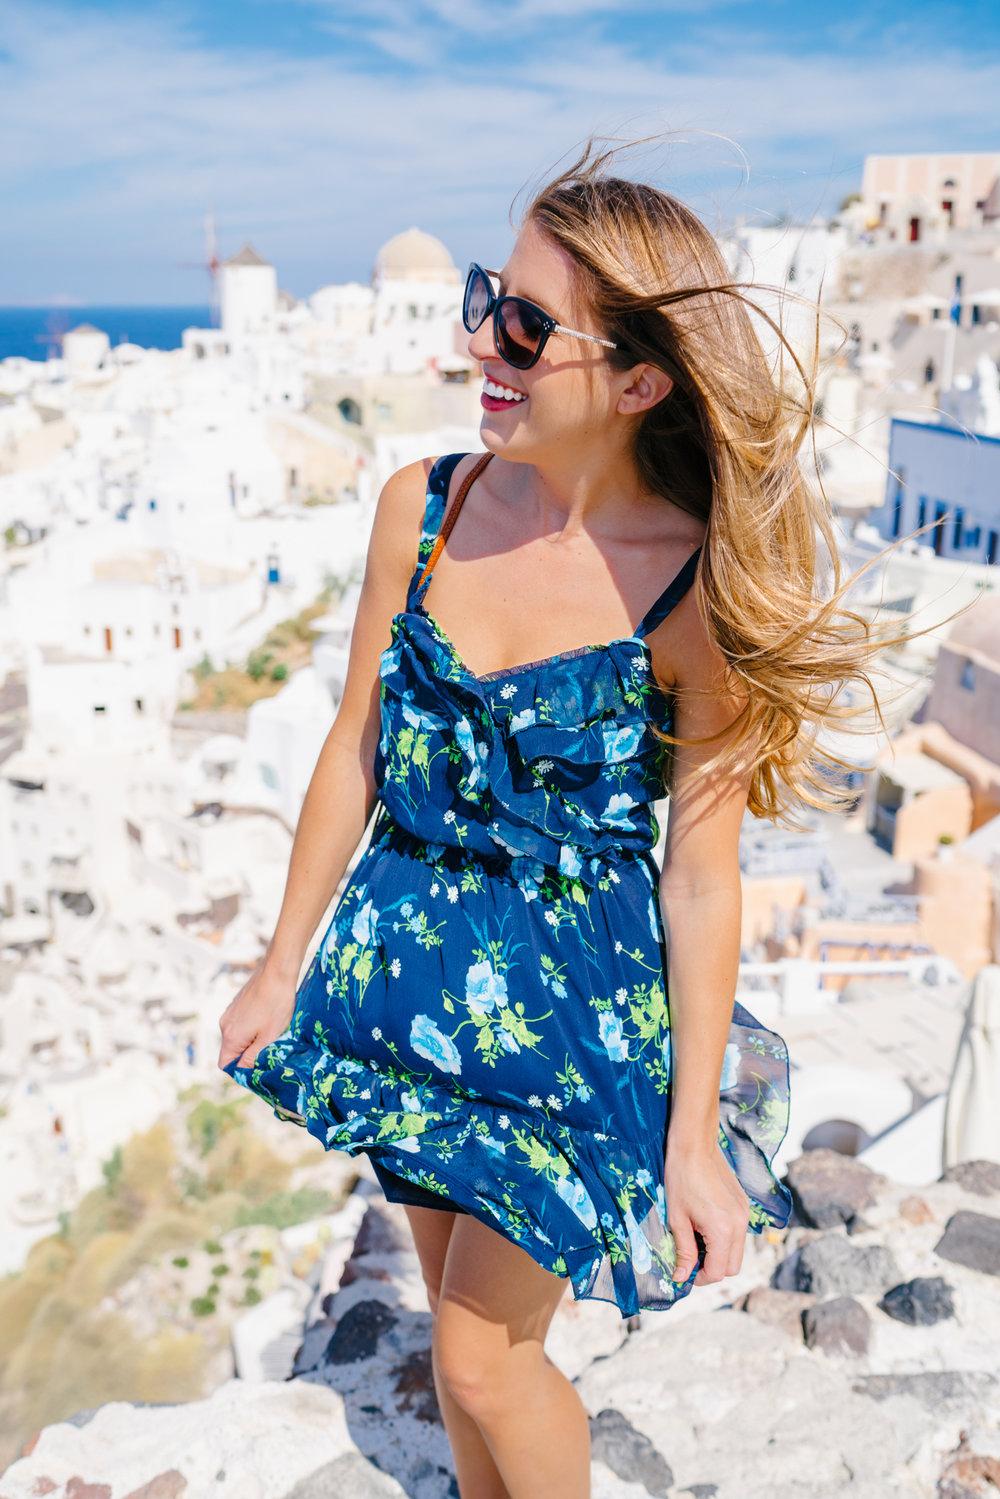 Blue Floral Ruffle Dress in Santorini Blue